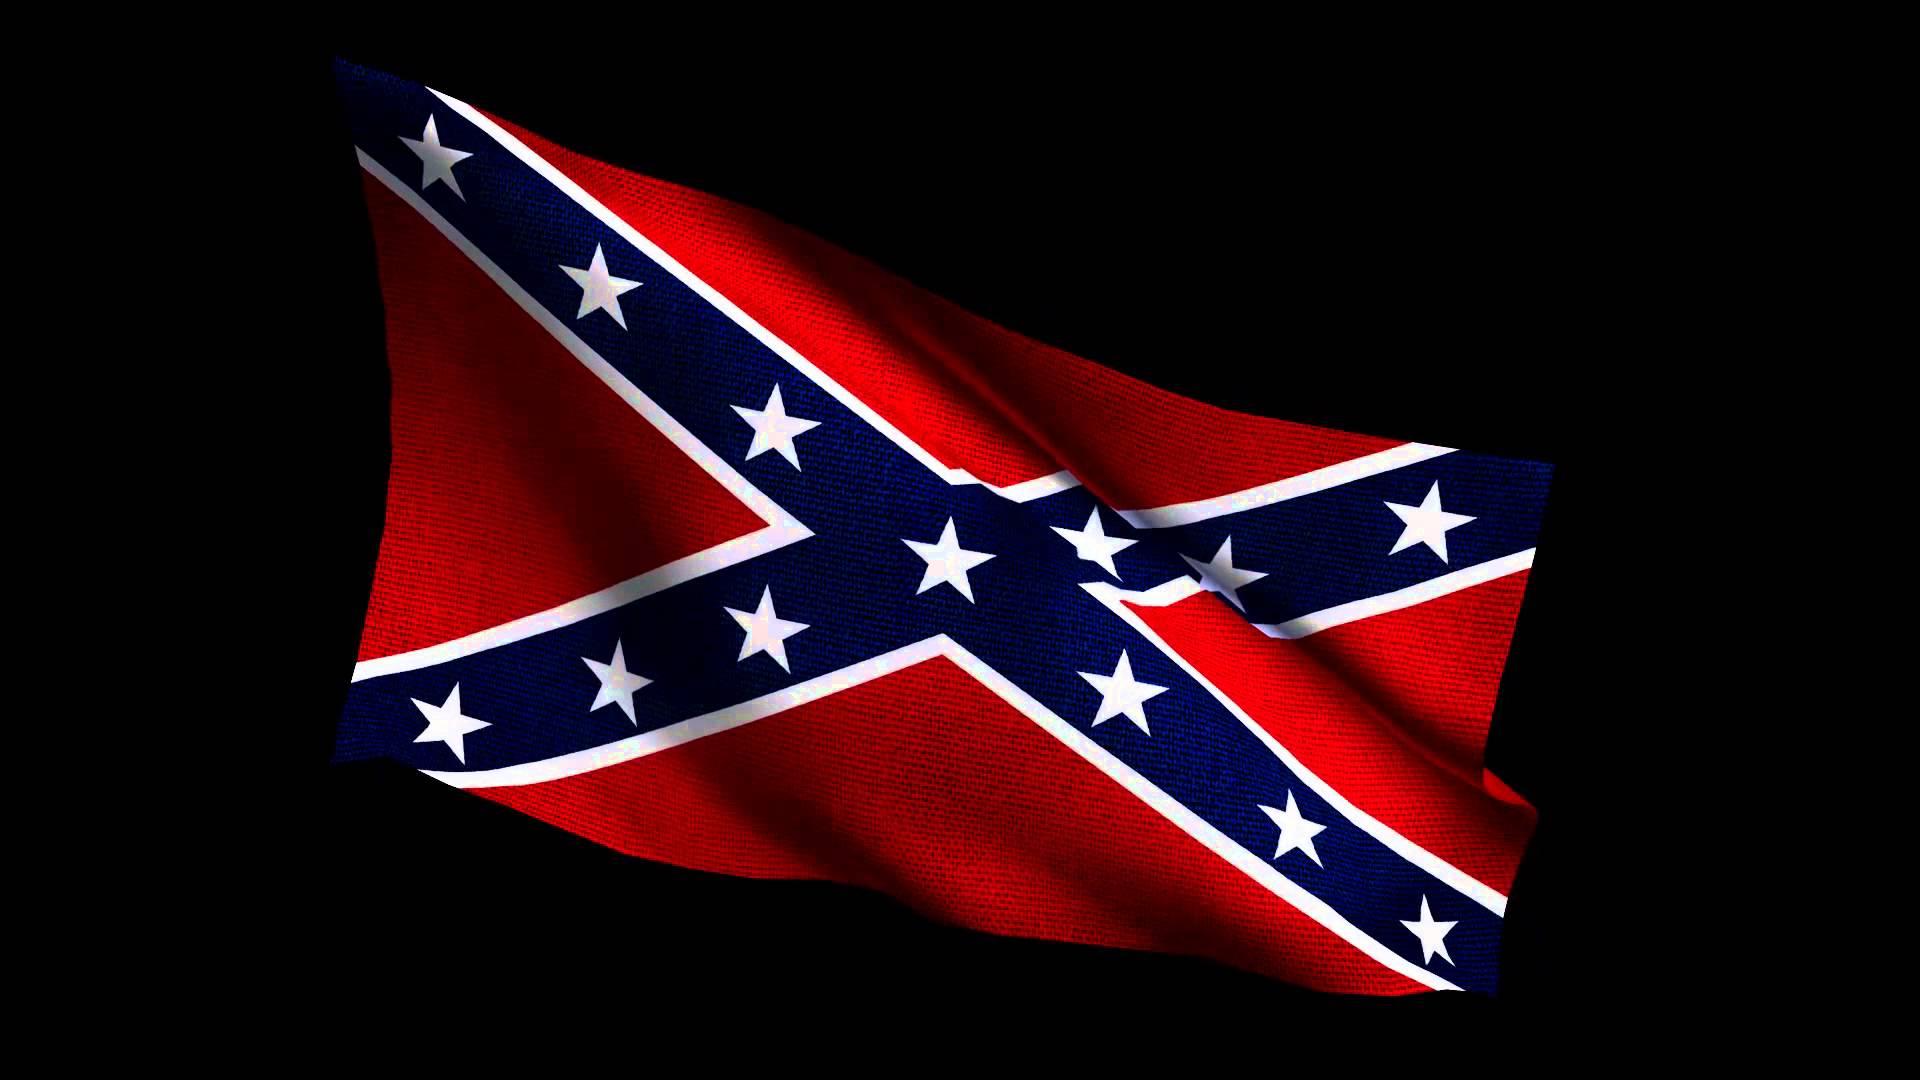 Confederate Flag waving 1920x1080p 1920x1080